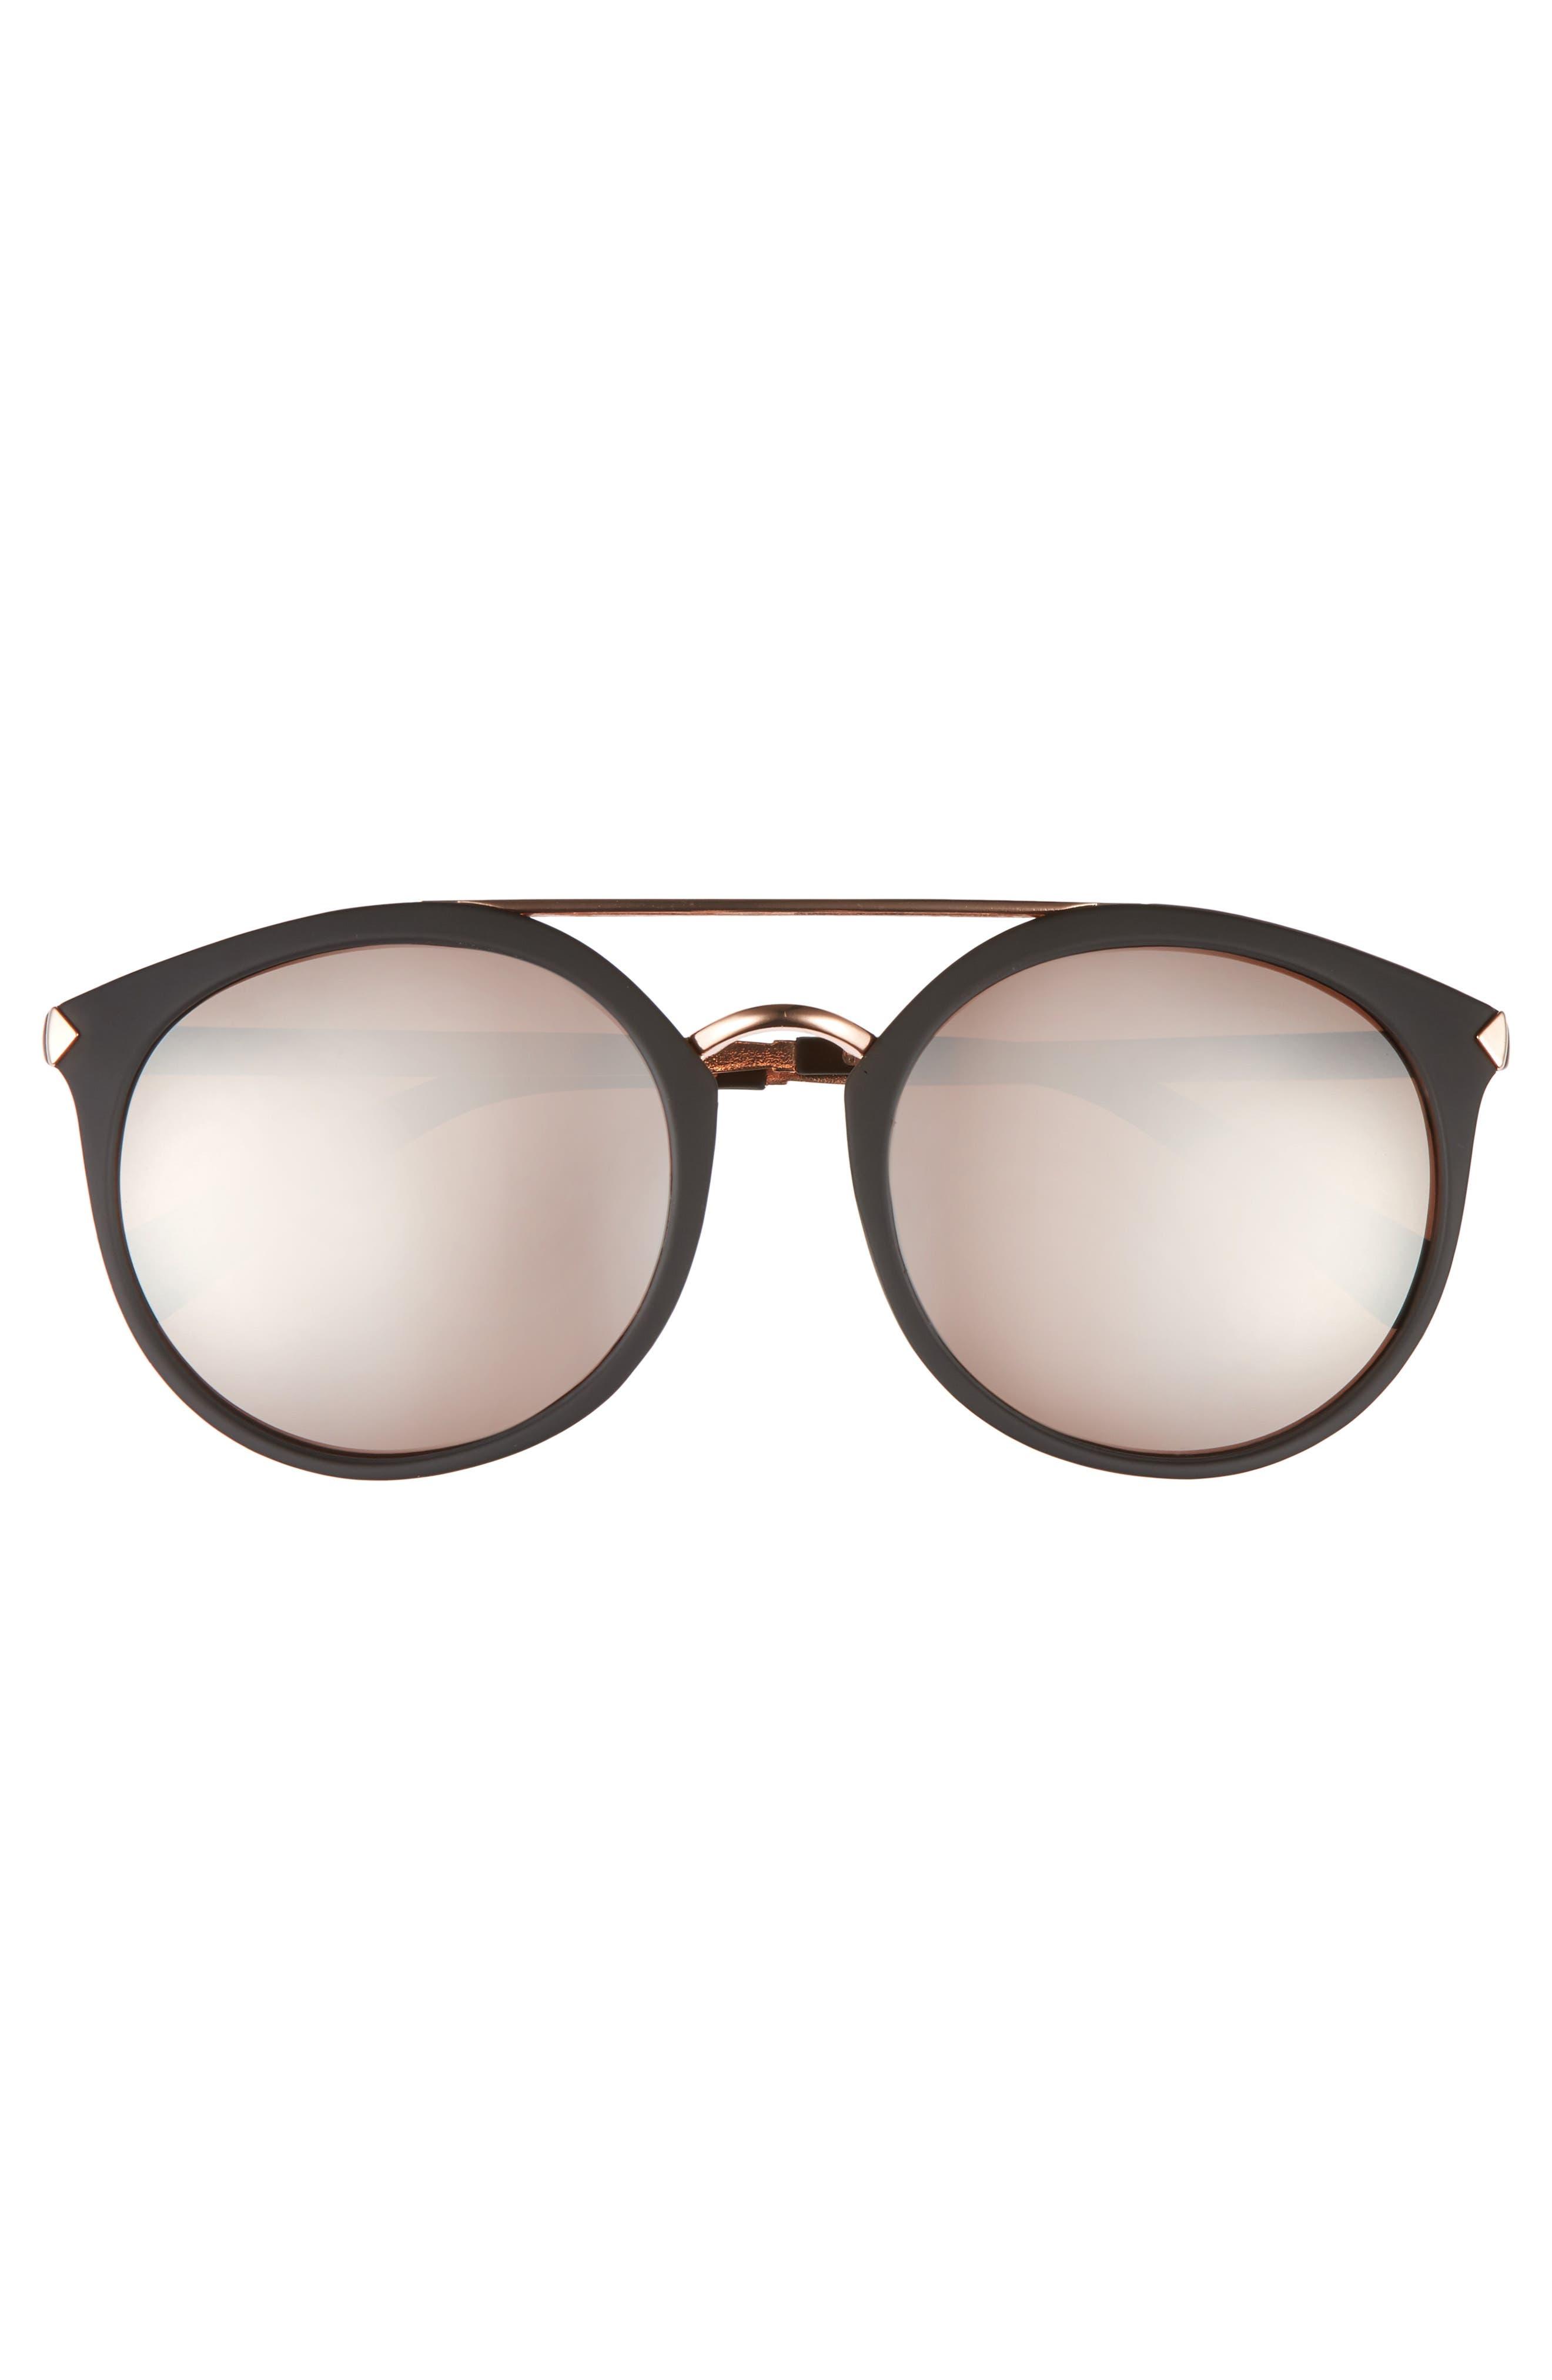 55mm Mirrored Sunglasses,                             Alternate thumbnail 3, color,                             Black/ Rose Gold